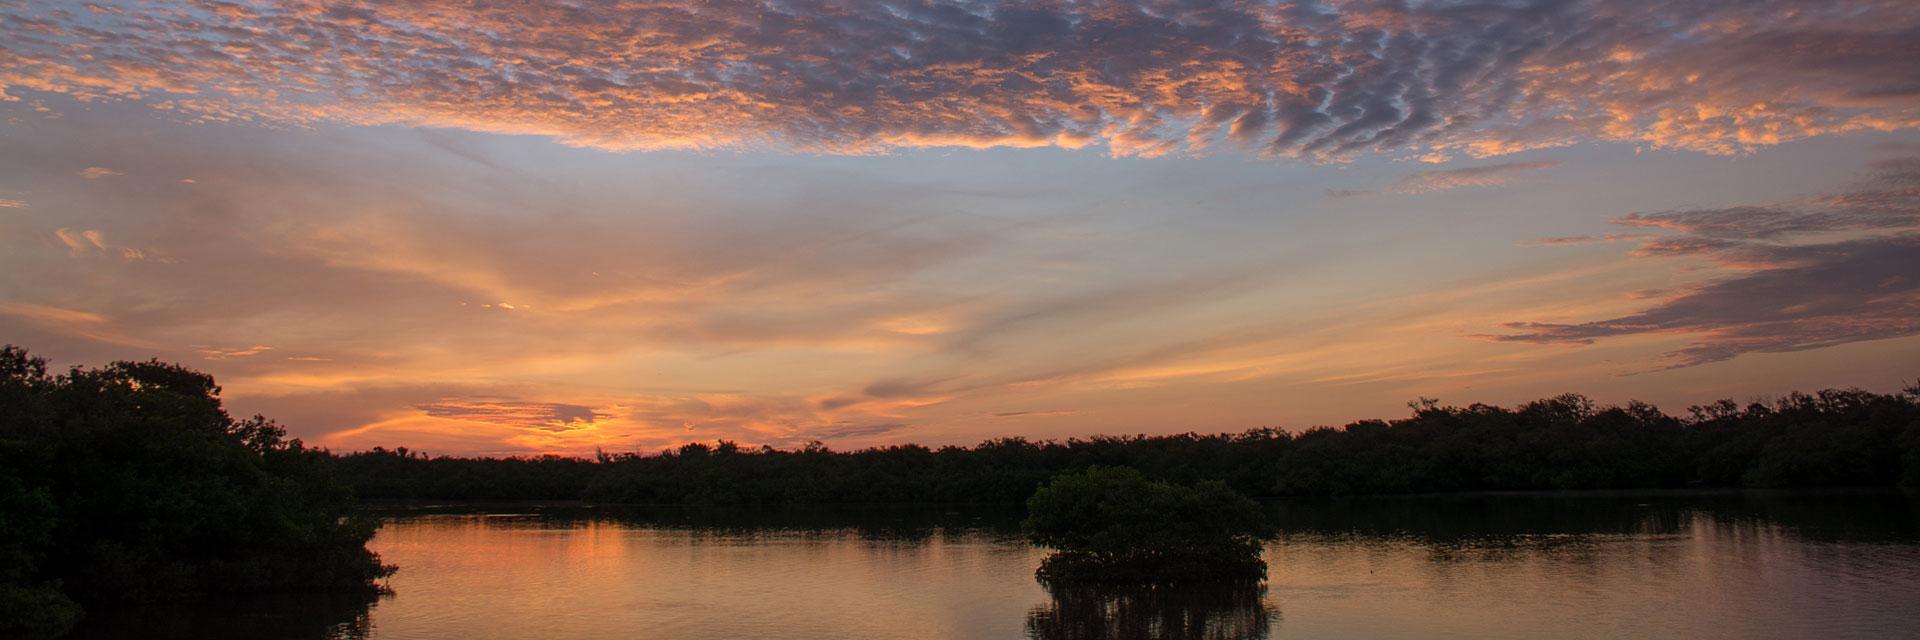 Mangroves at sunset.